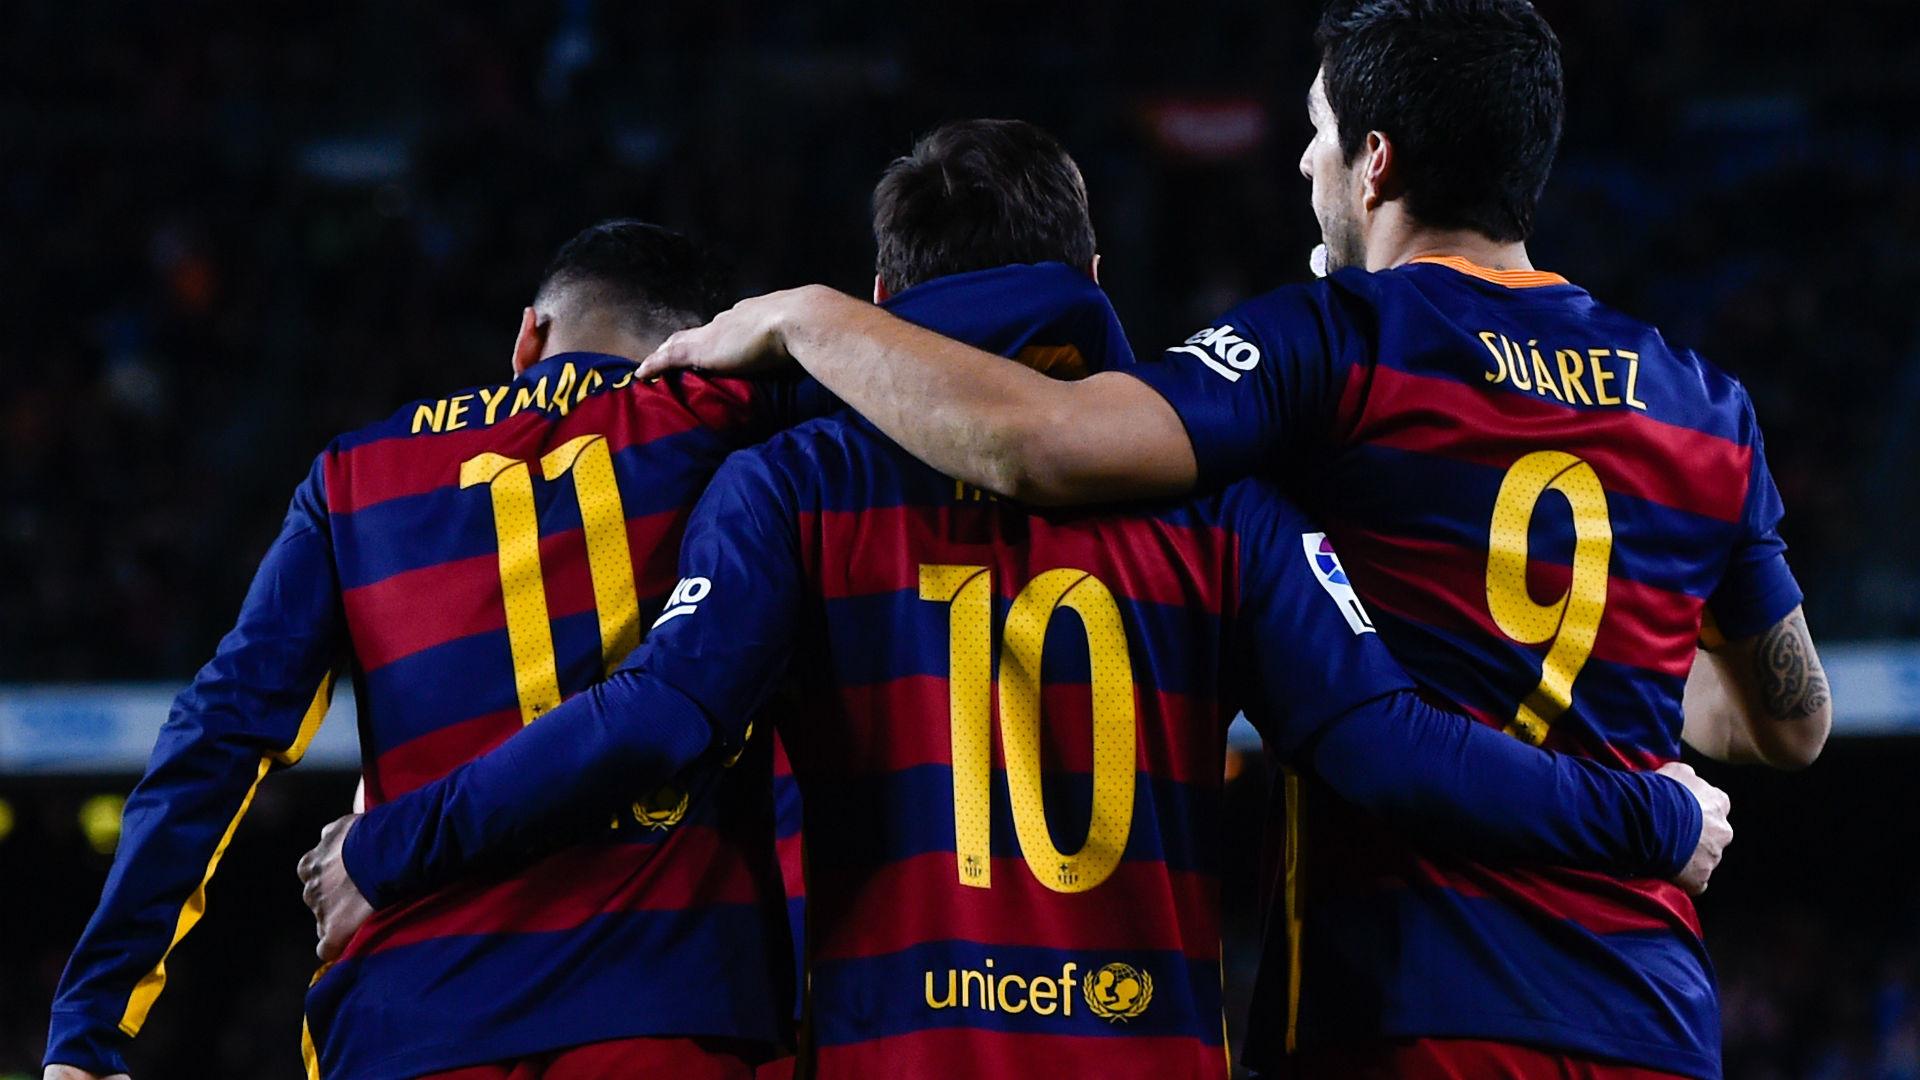 162 Messi And Neymar Wallpaper Hd